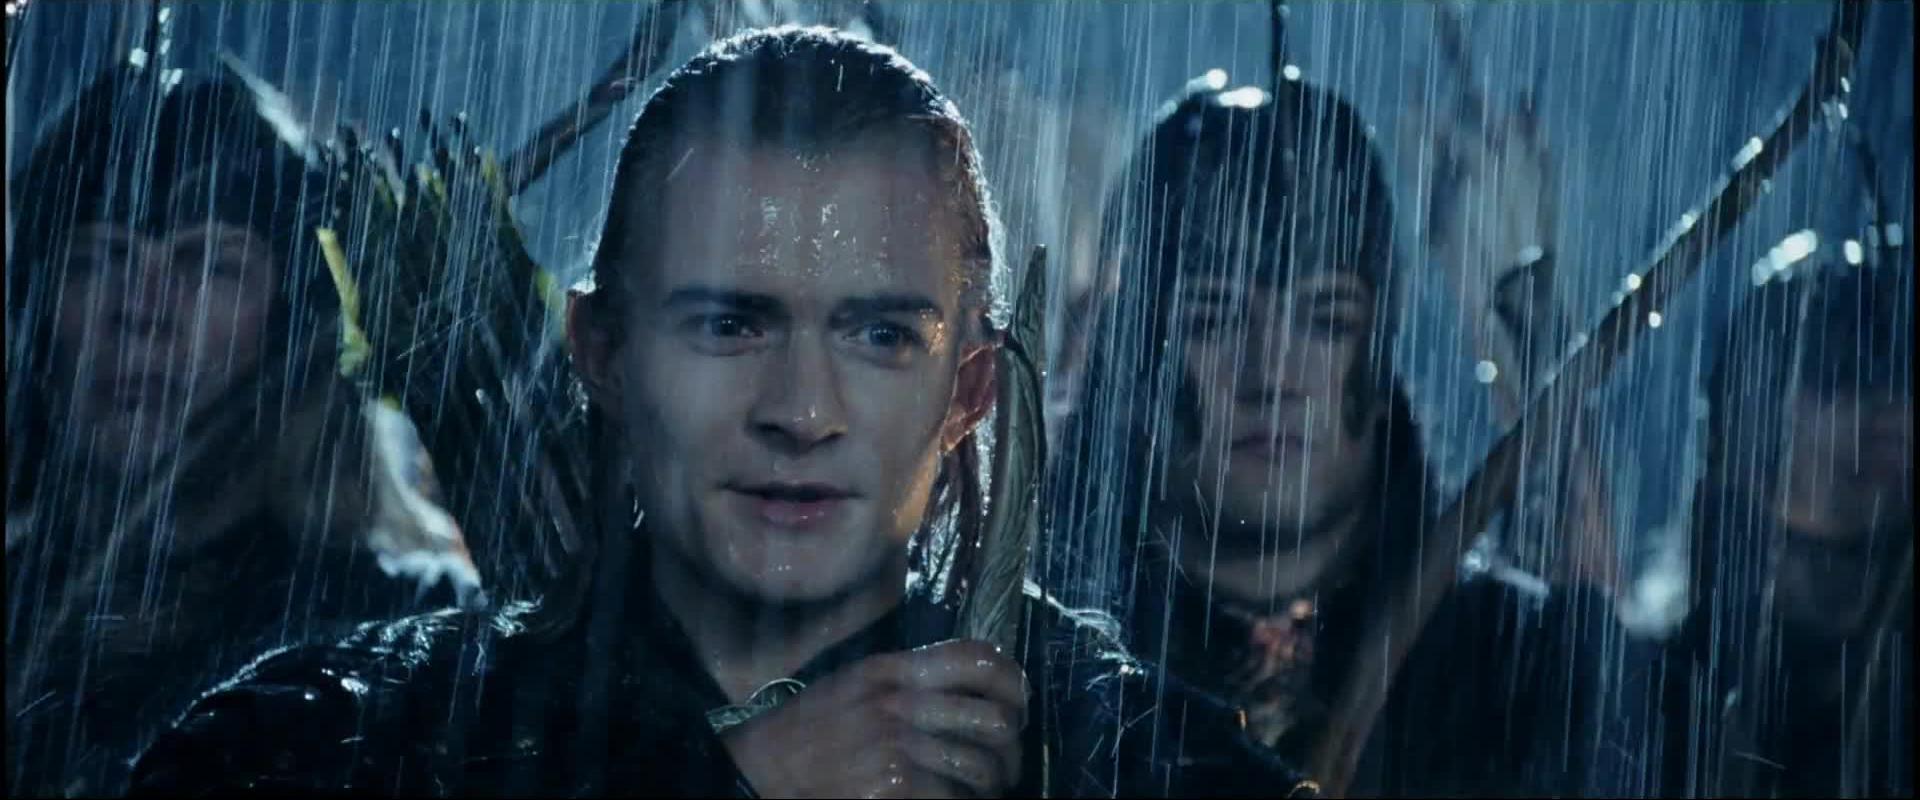 El Señor de los Anillos película animada Warner Bros. Kenji Kamiyama Lord of the Rings: The War of the Rohirrim